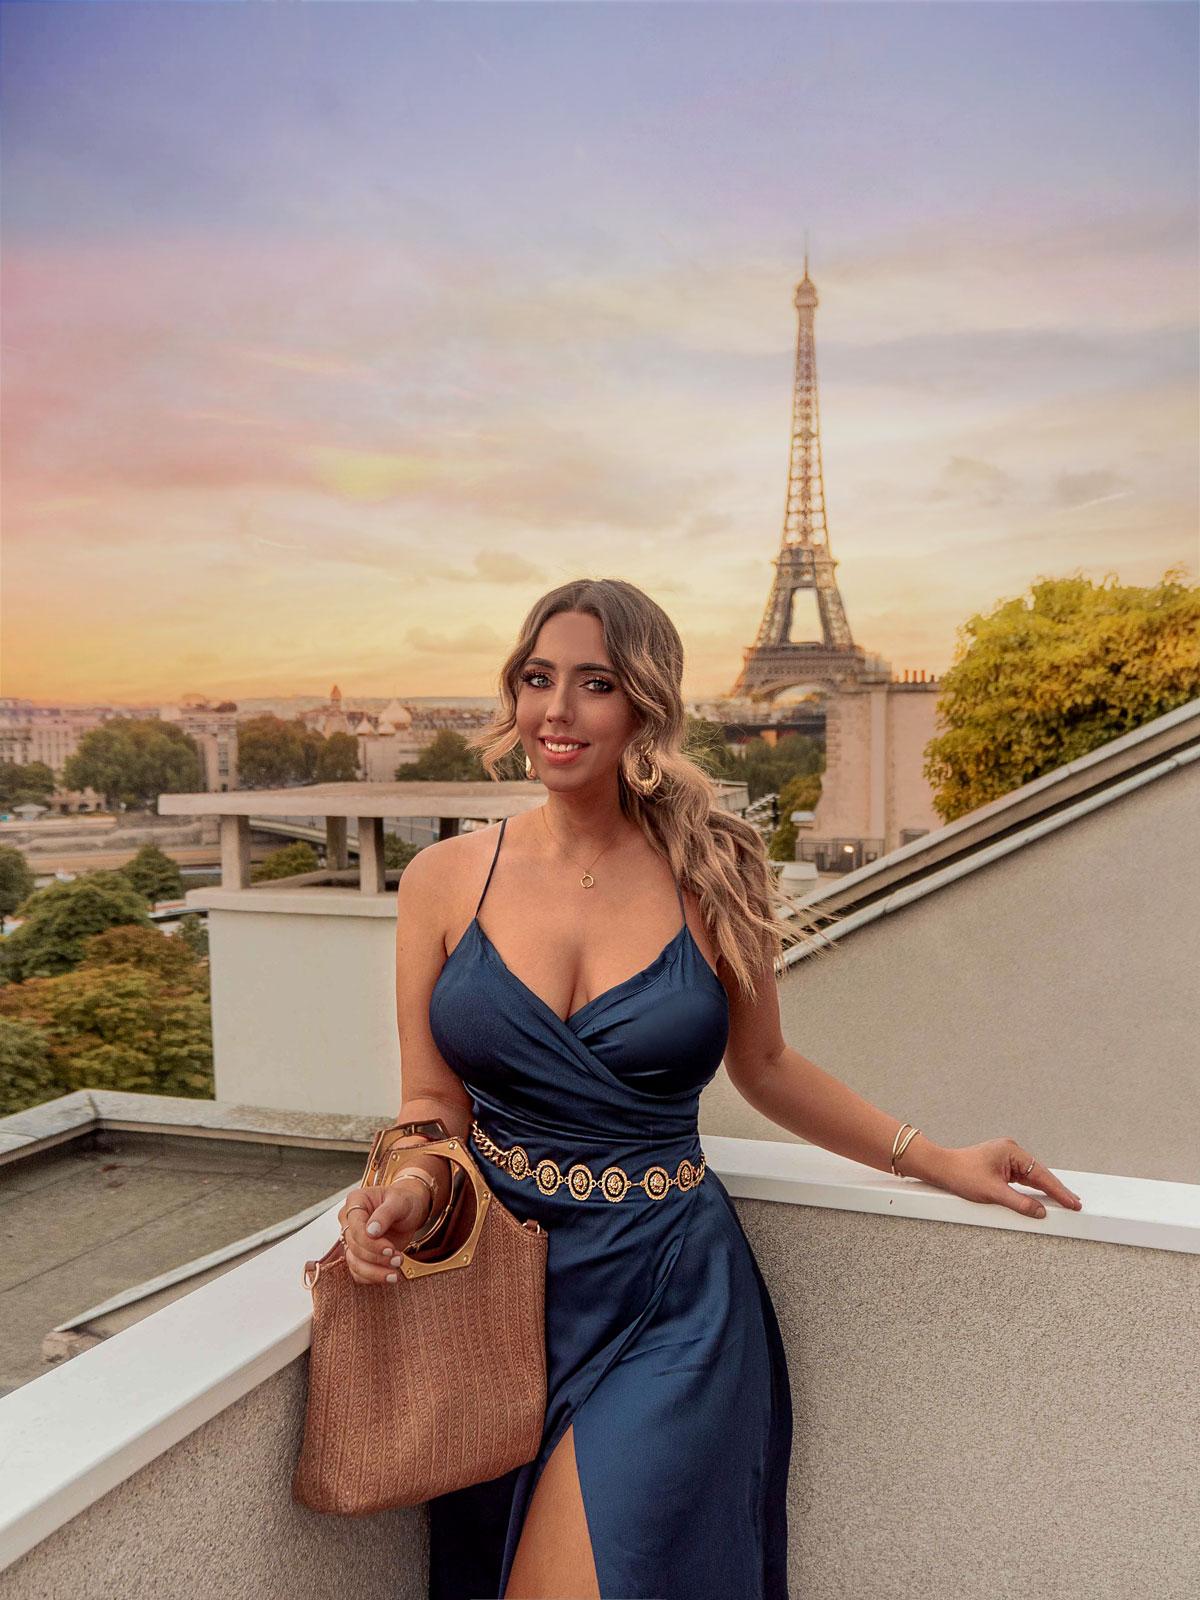 20-Best-Paris-Photography-Locations-Instagram-Spots--@kelseyinlondon-Kelsey-Heinrichs--Restaurant-Maison-Blanche